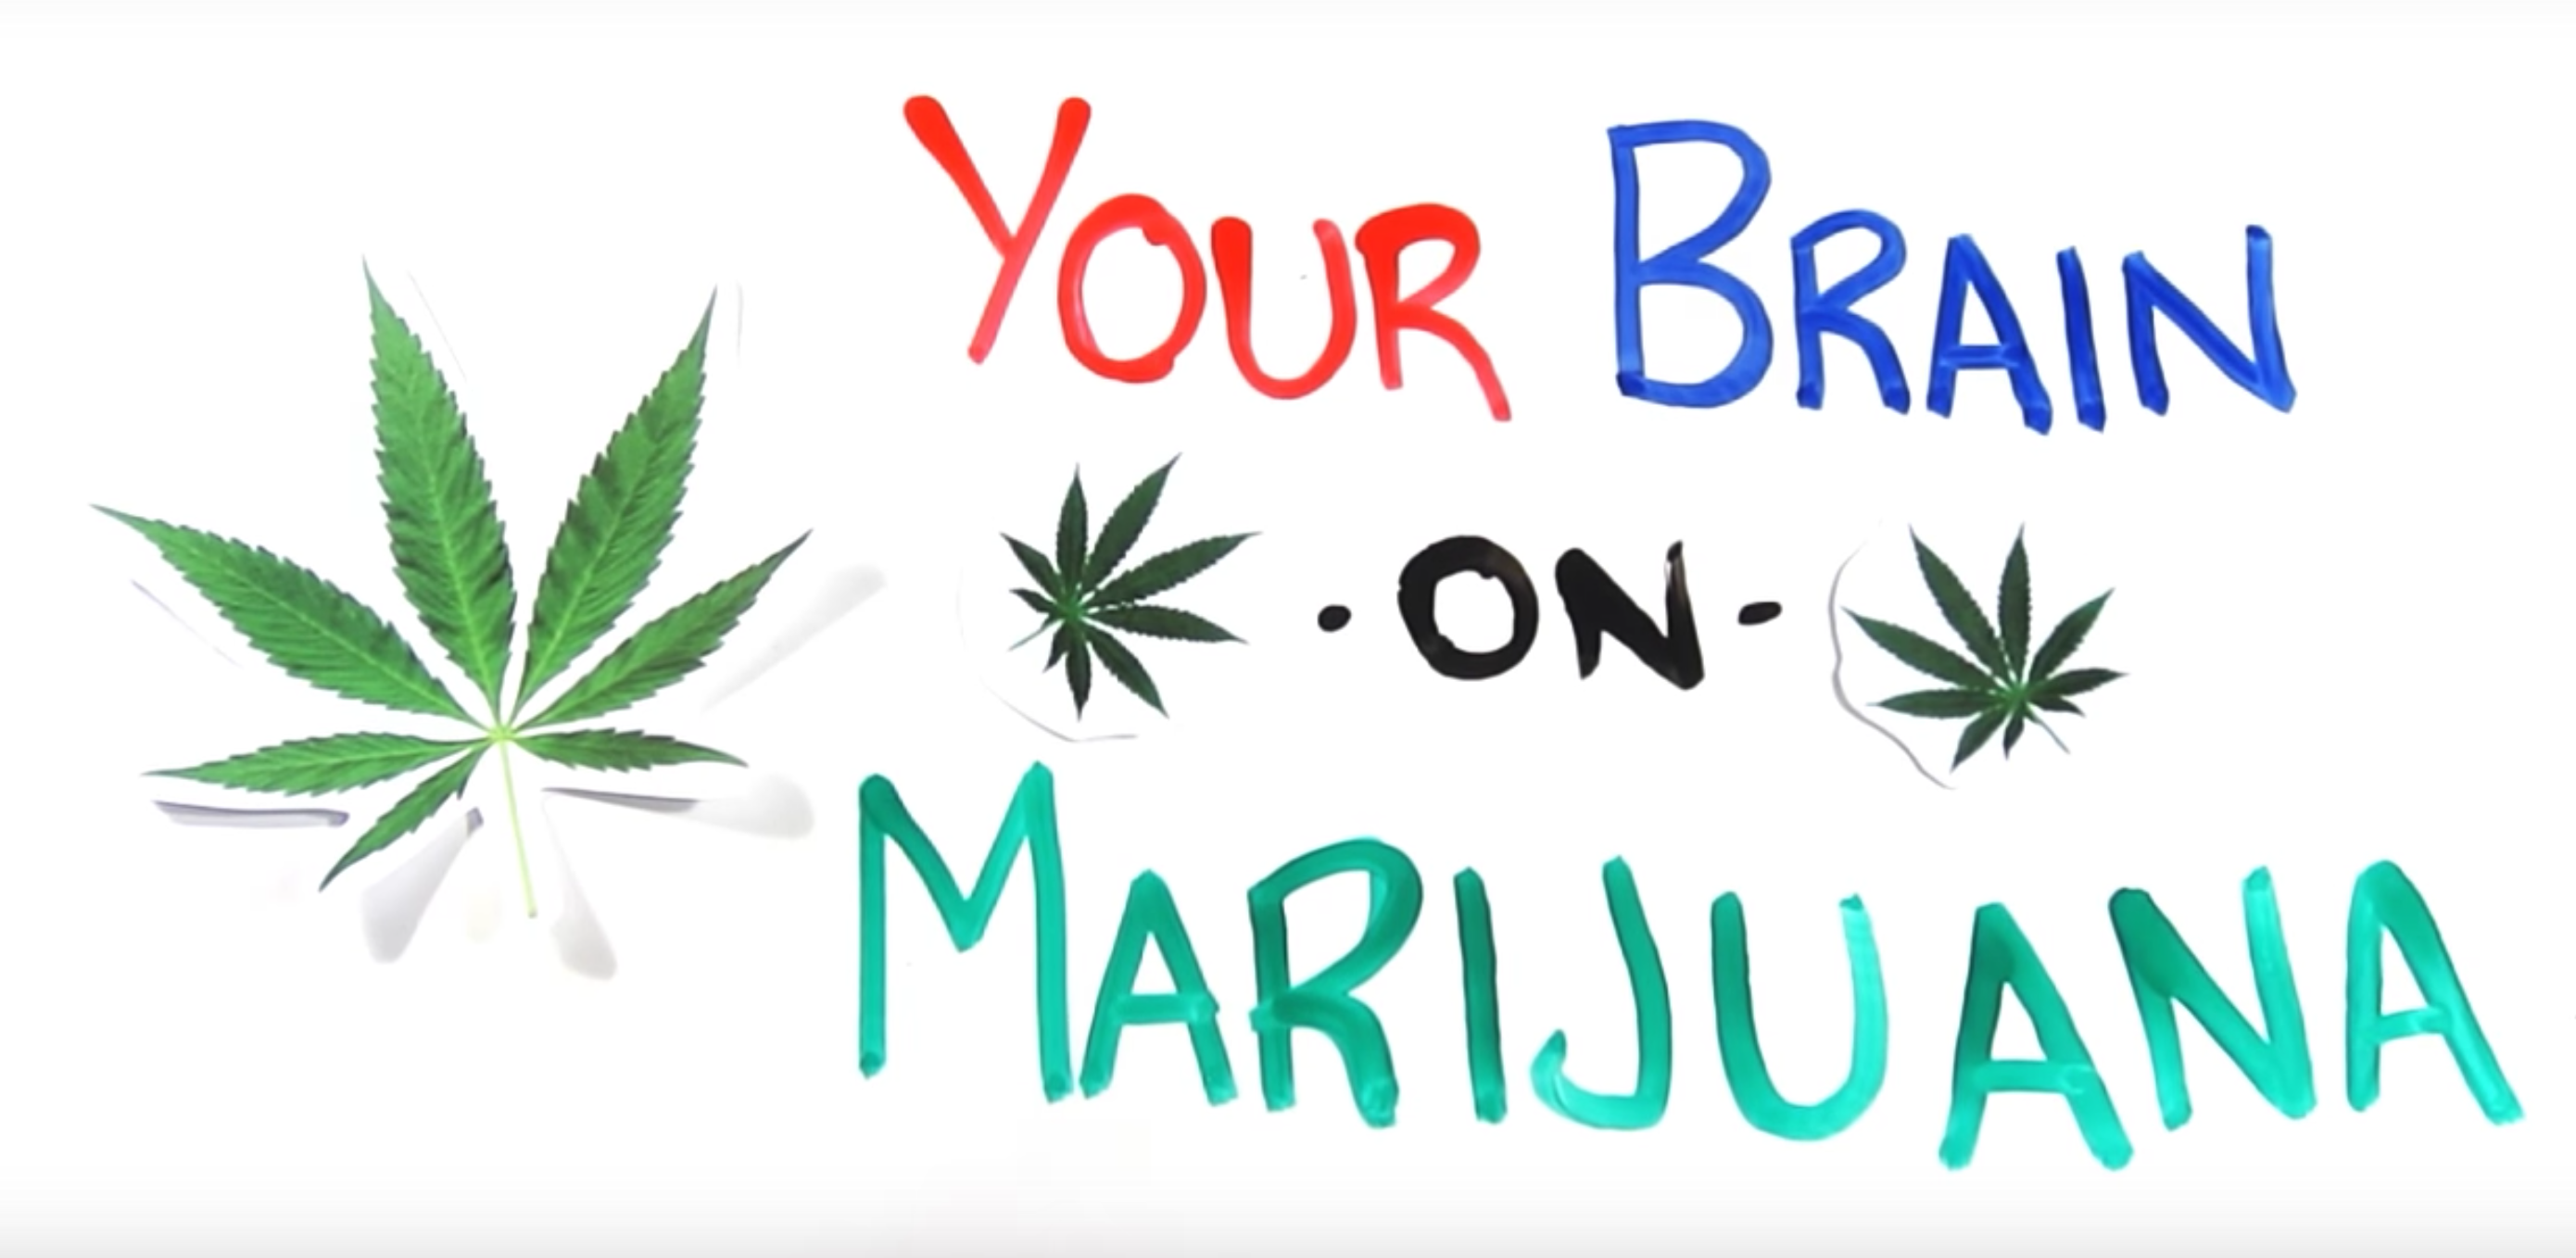 brain, marijuana, 4/20, weed, drugs, cannibis, purp skurp